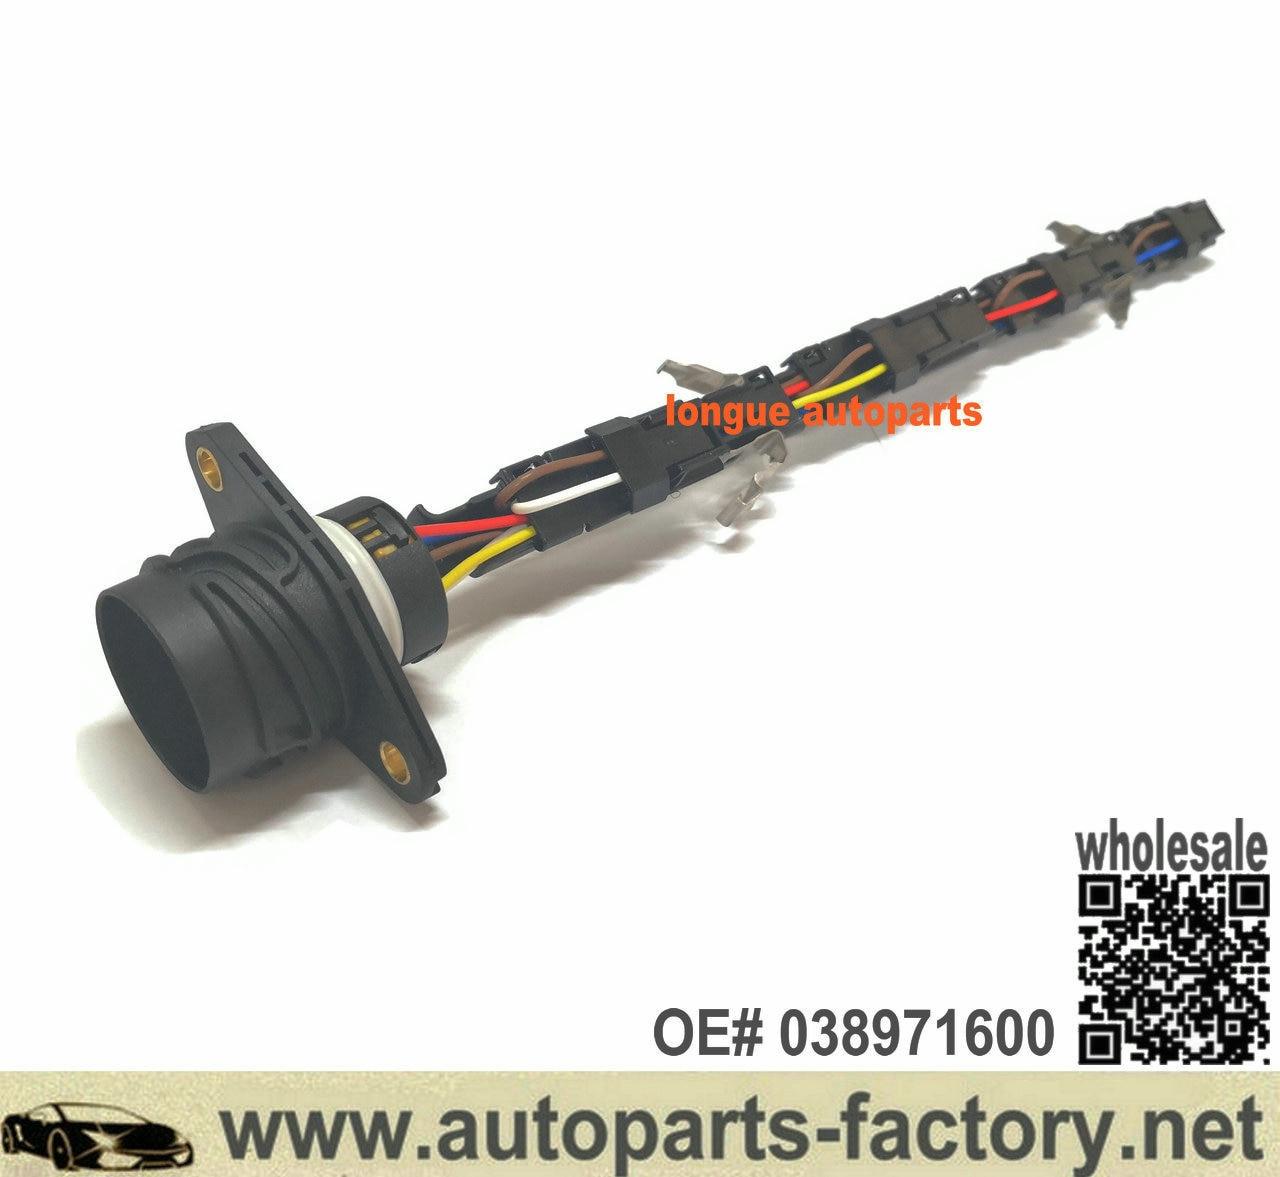 Longyue Genuine VW Diesel Injector Wiring Loom For VW 1.9 & 2.0 8v TDI PD Engines 038971600